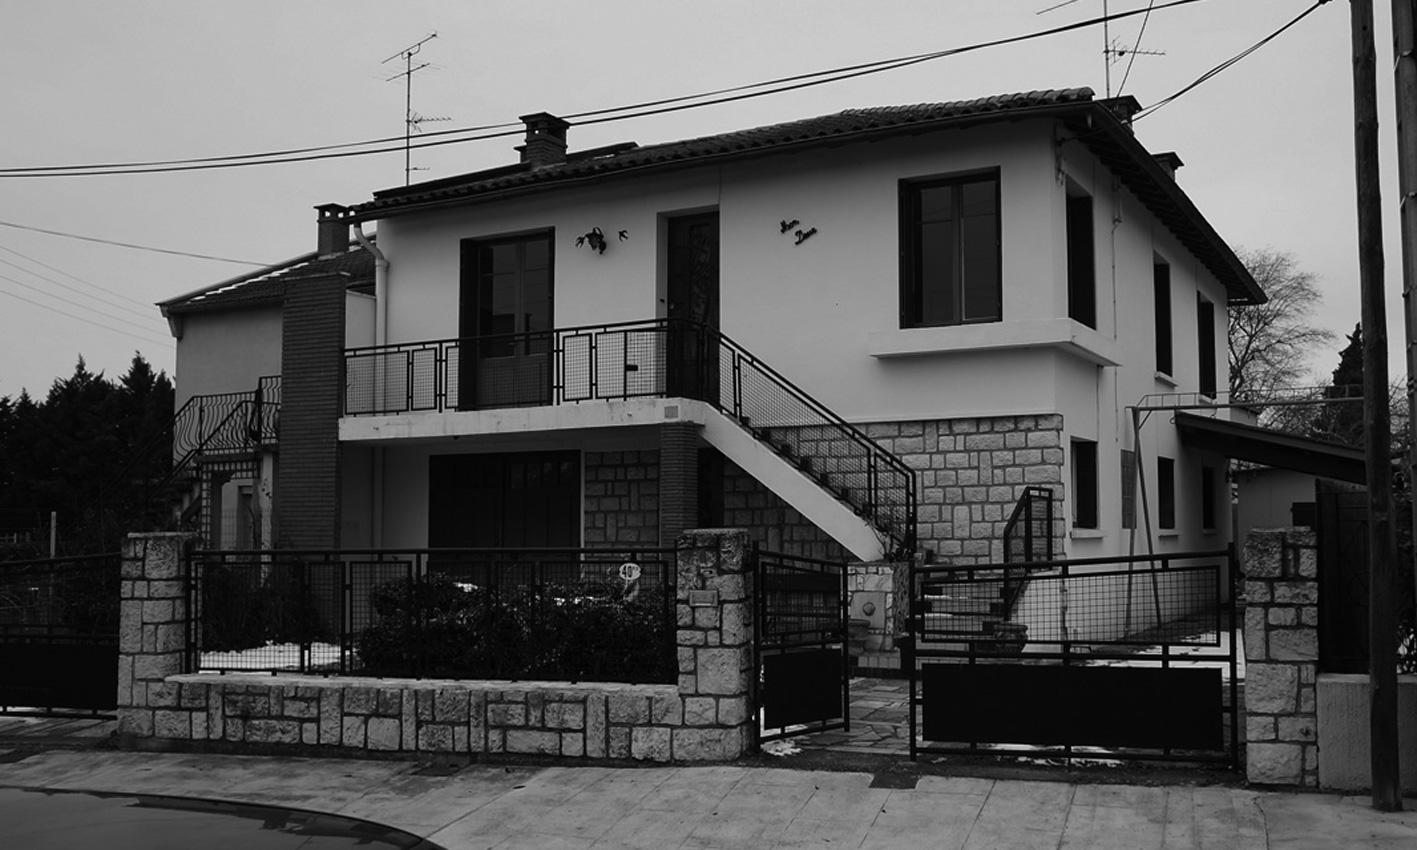 architecte renovation maison toulouse ventana blog. Black Bedroom Furniture Sets. Home Design Ideas